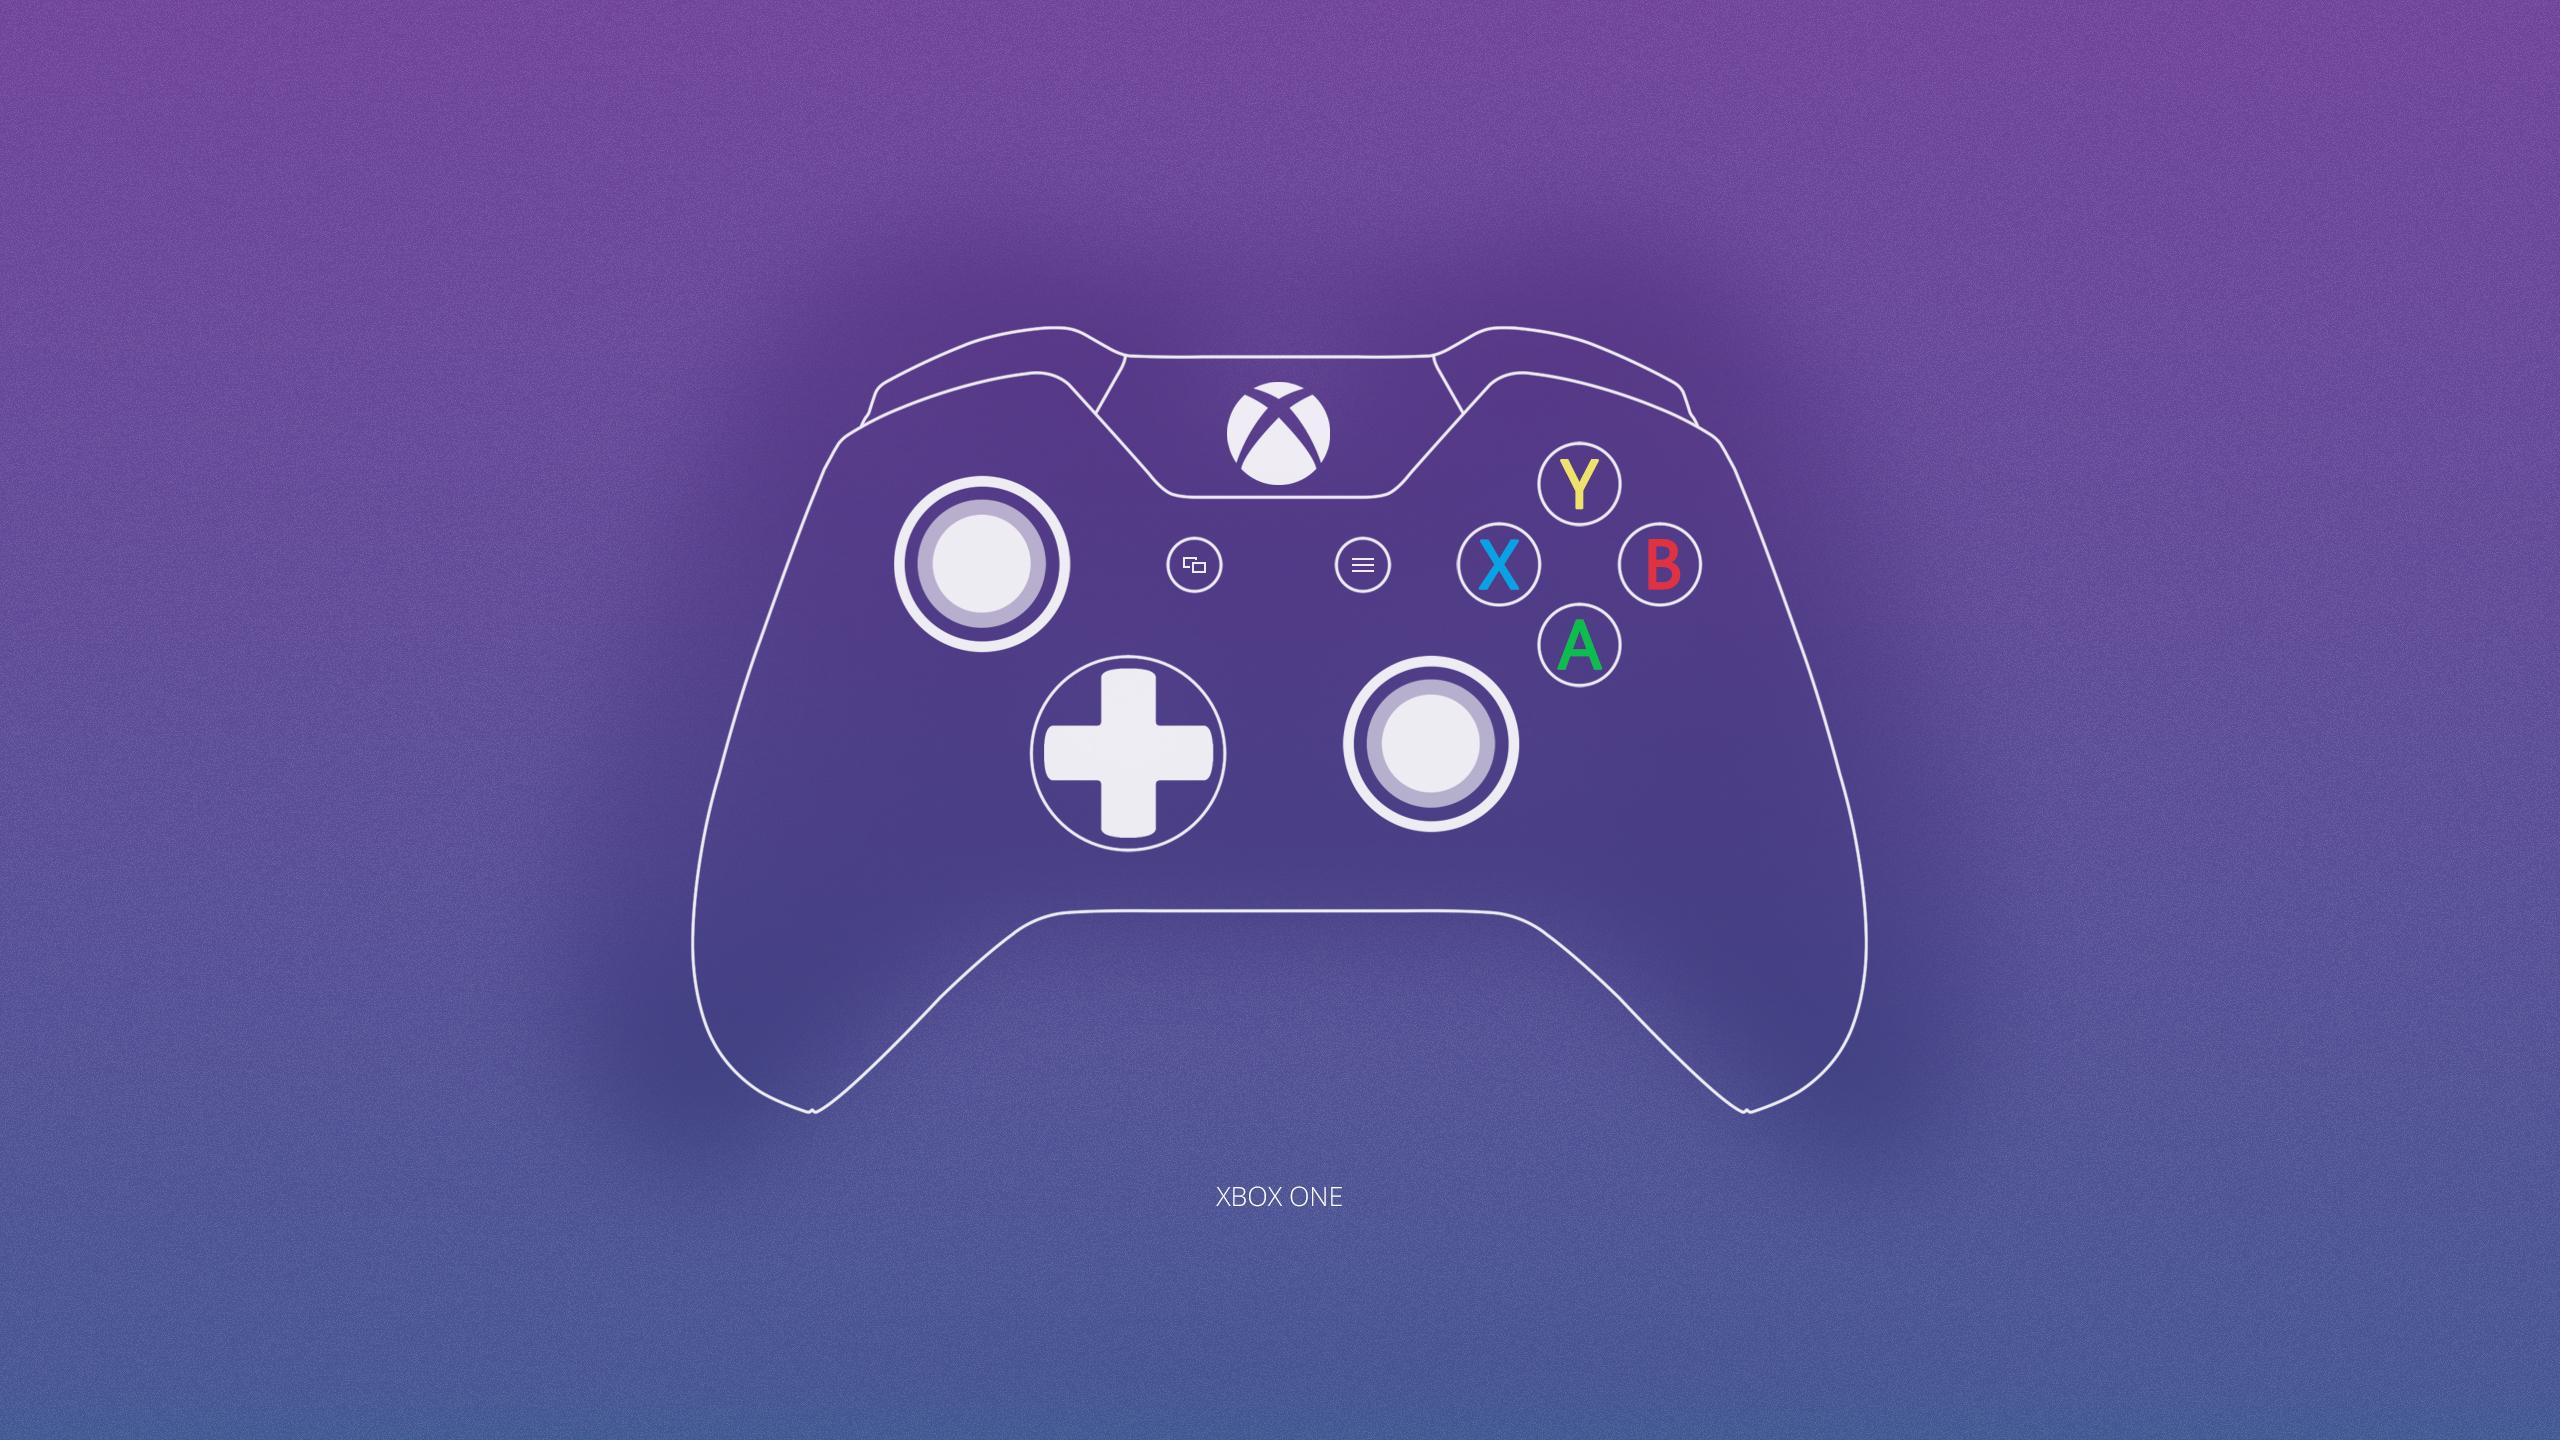 D Line Drawings Xbox One : 分享一张xboxone的桌面壁纸……大图杀猫。 xbox one综合讨论区 a vg电玩部落论坛